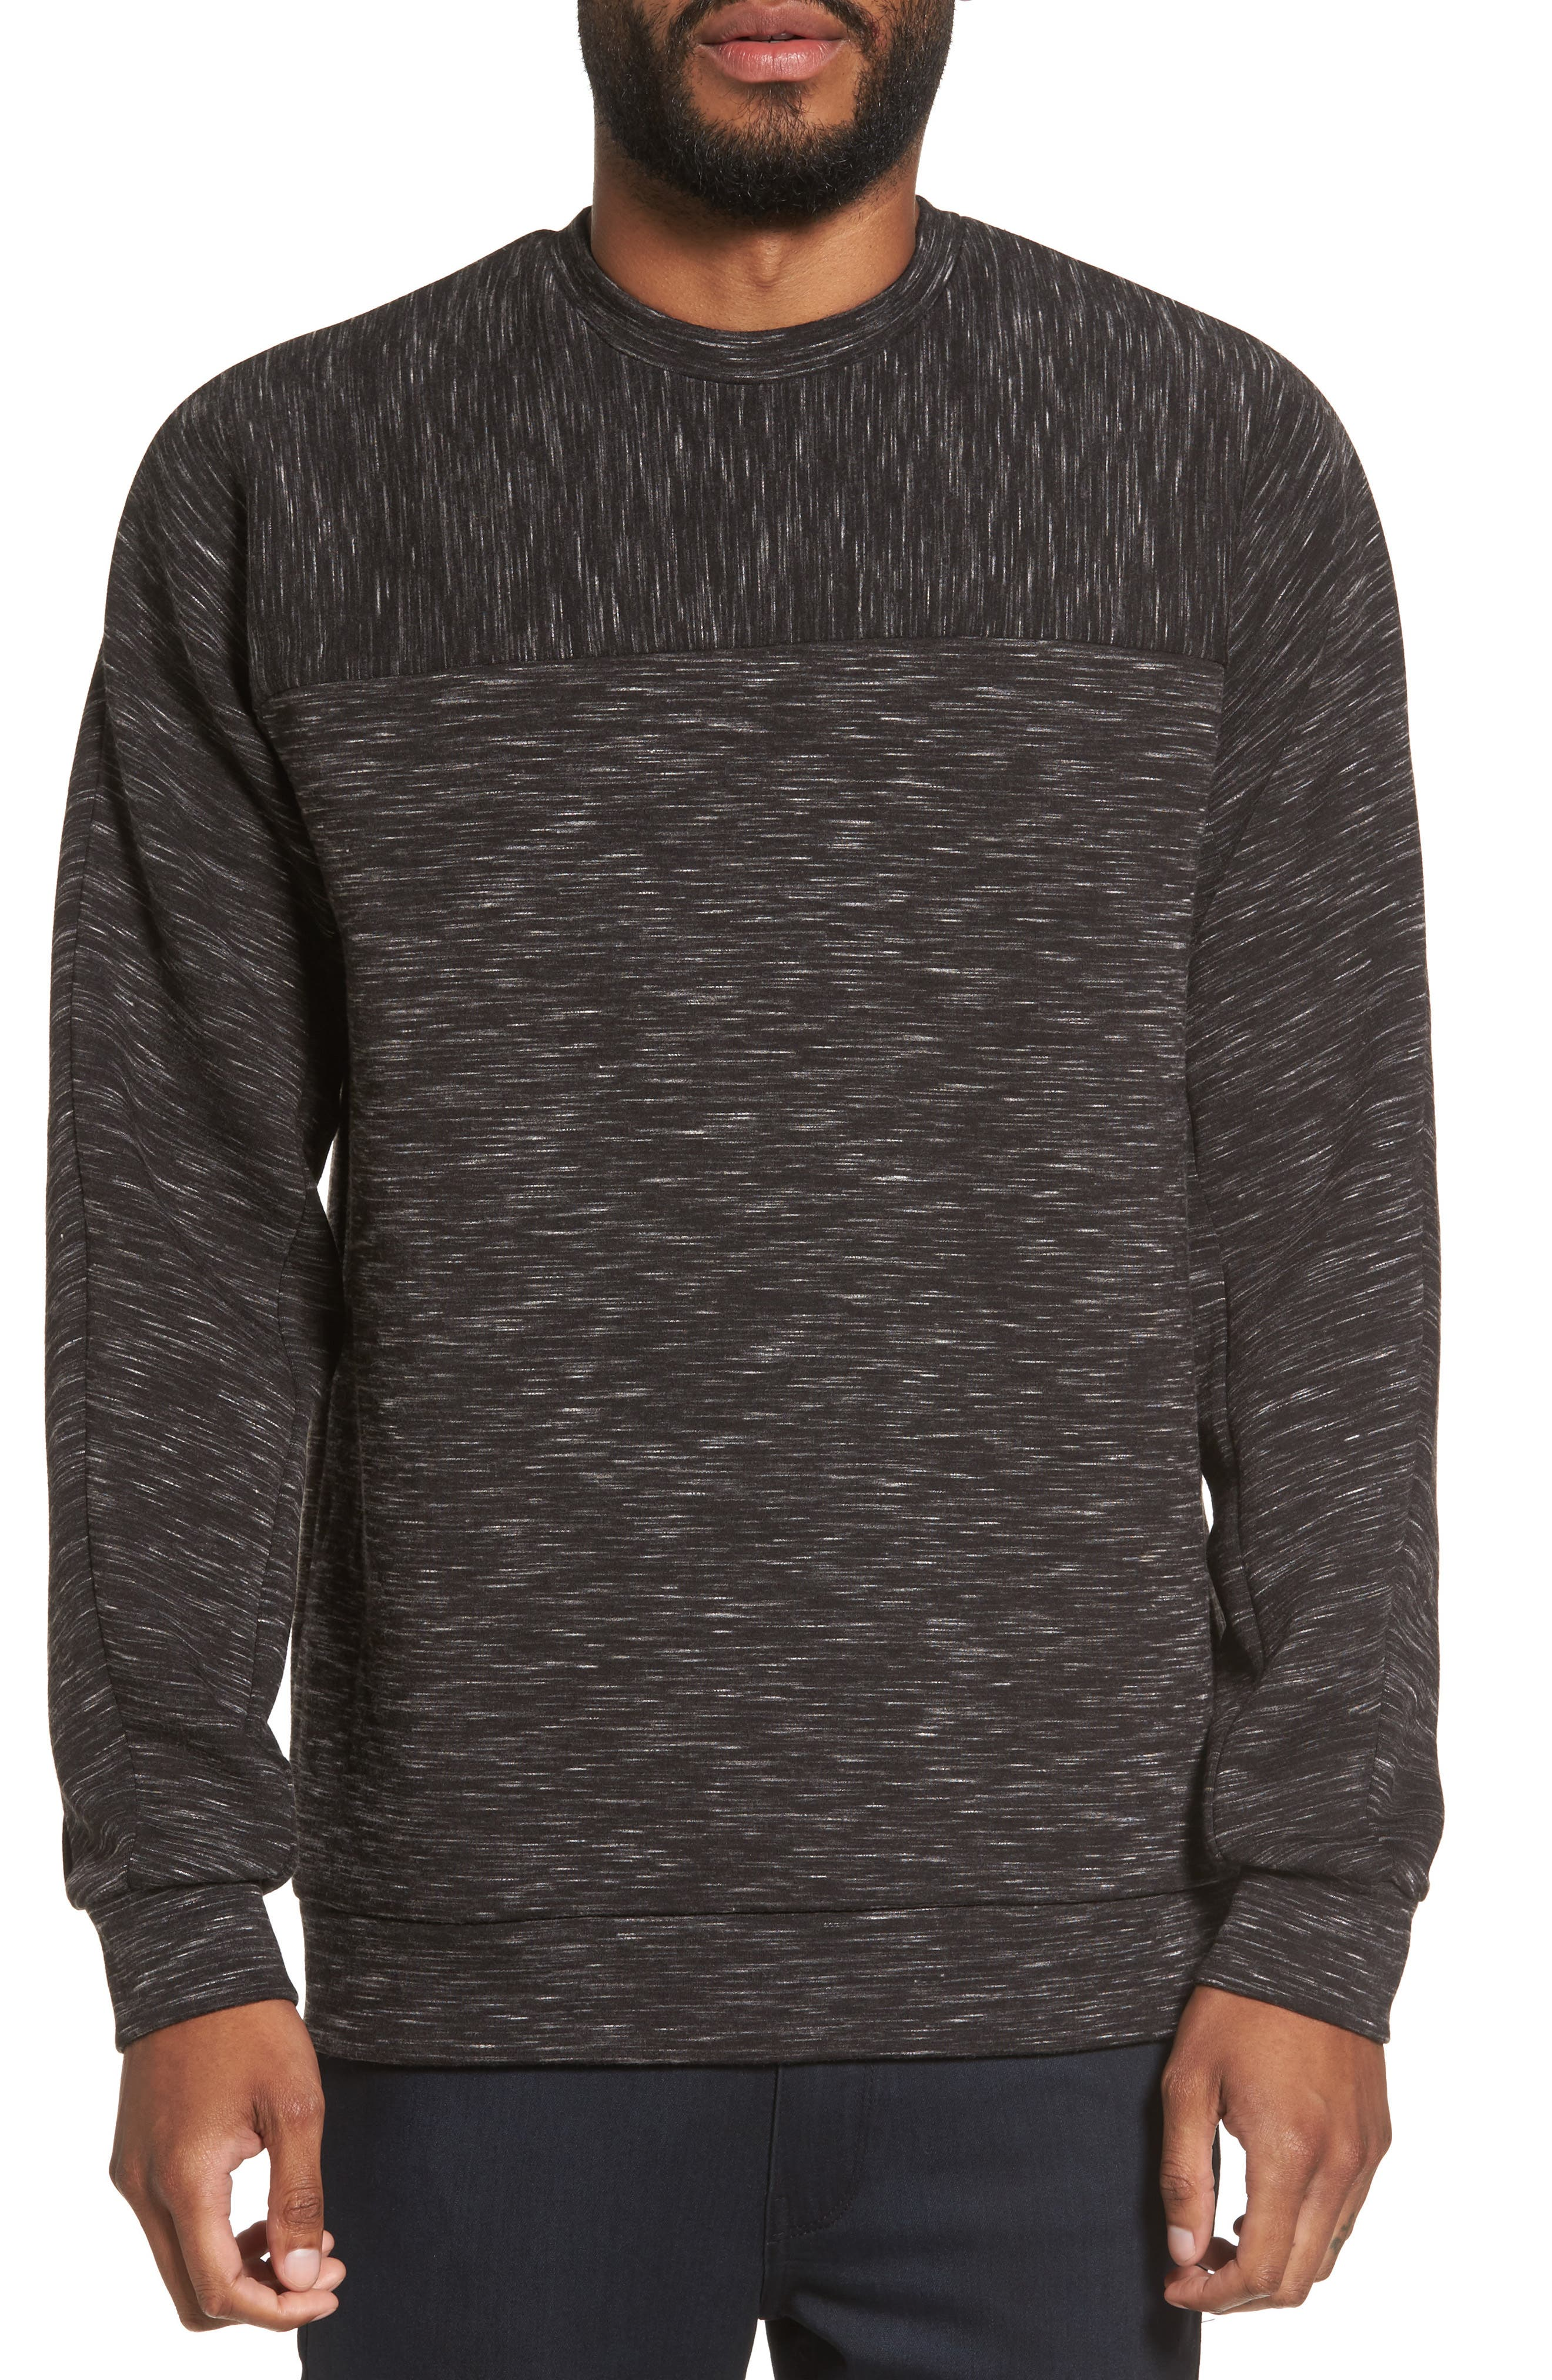 Main Image - Calibrate Side Zip Crewneck Sweatshirt